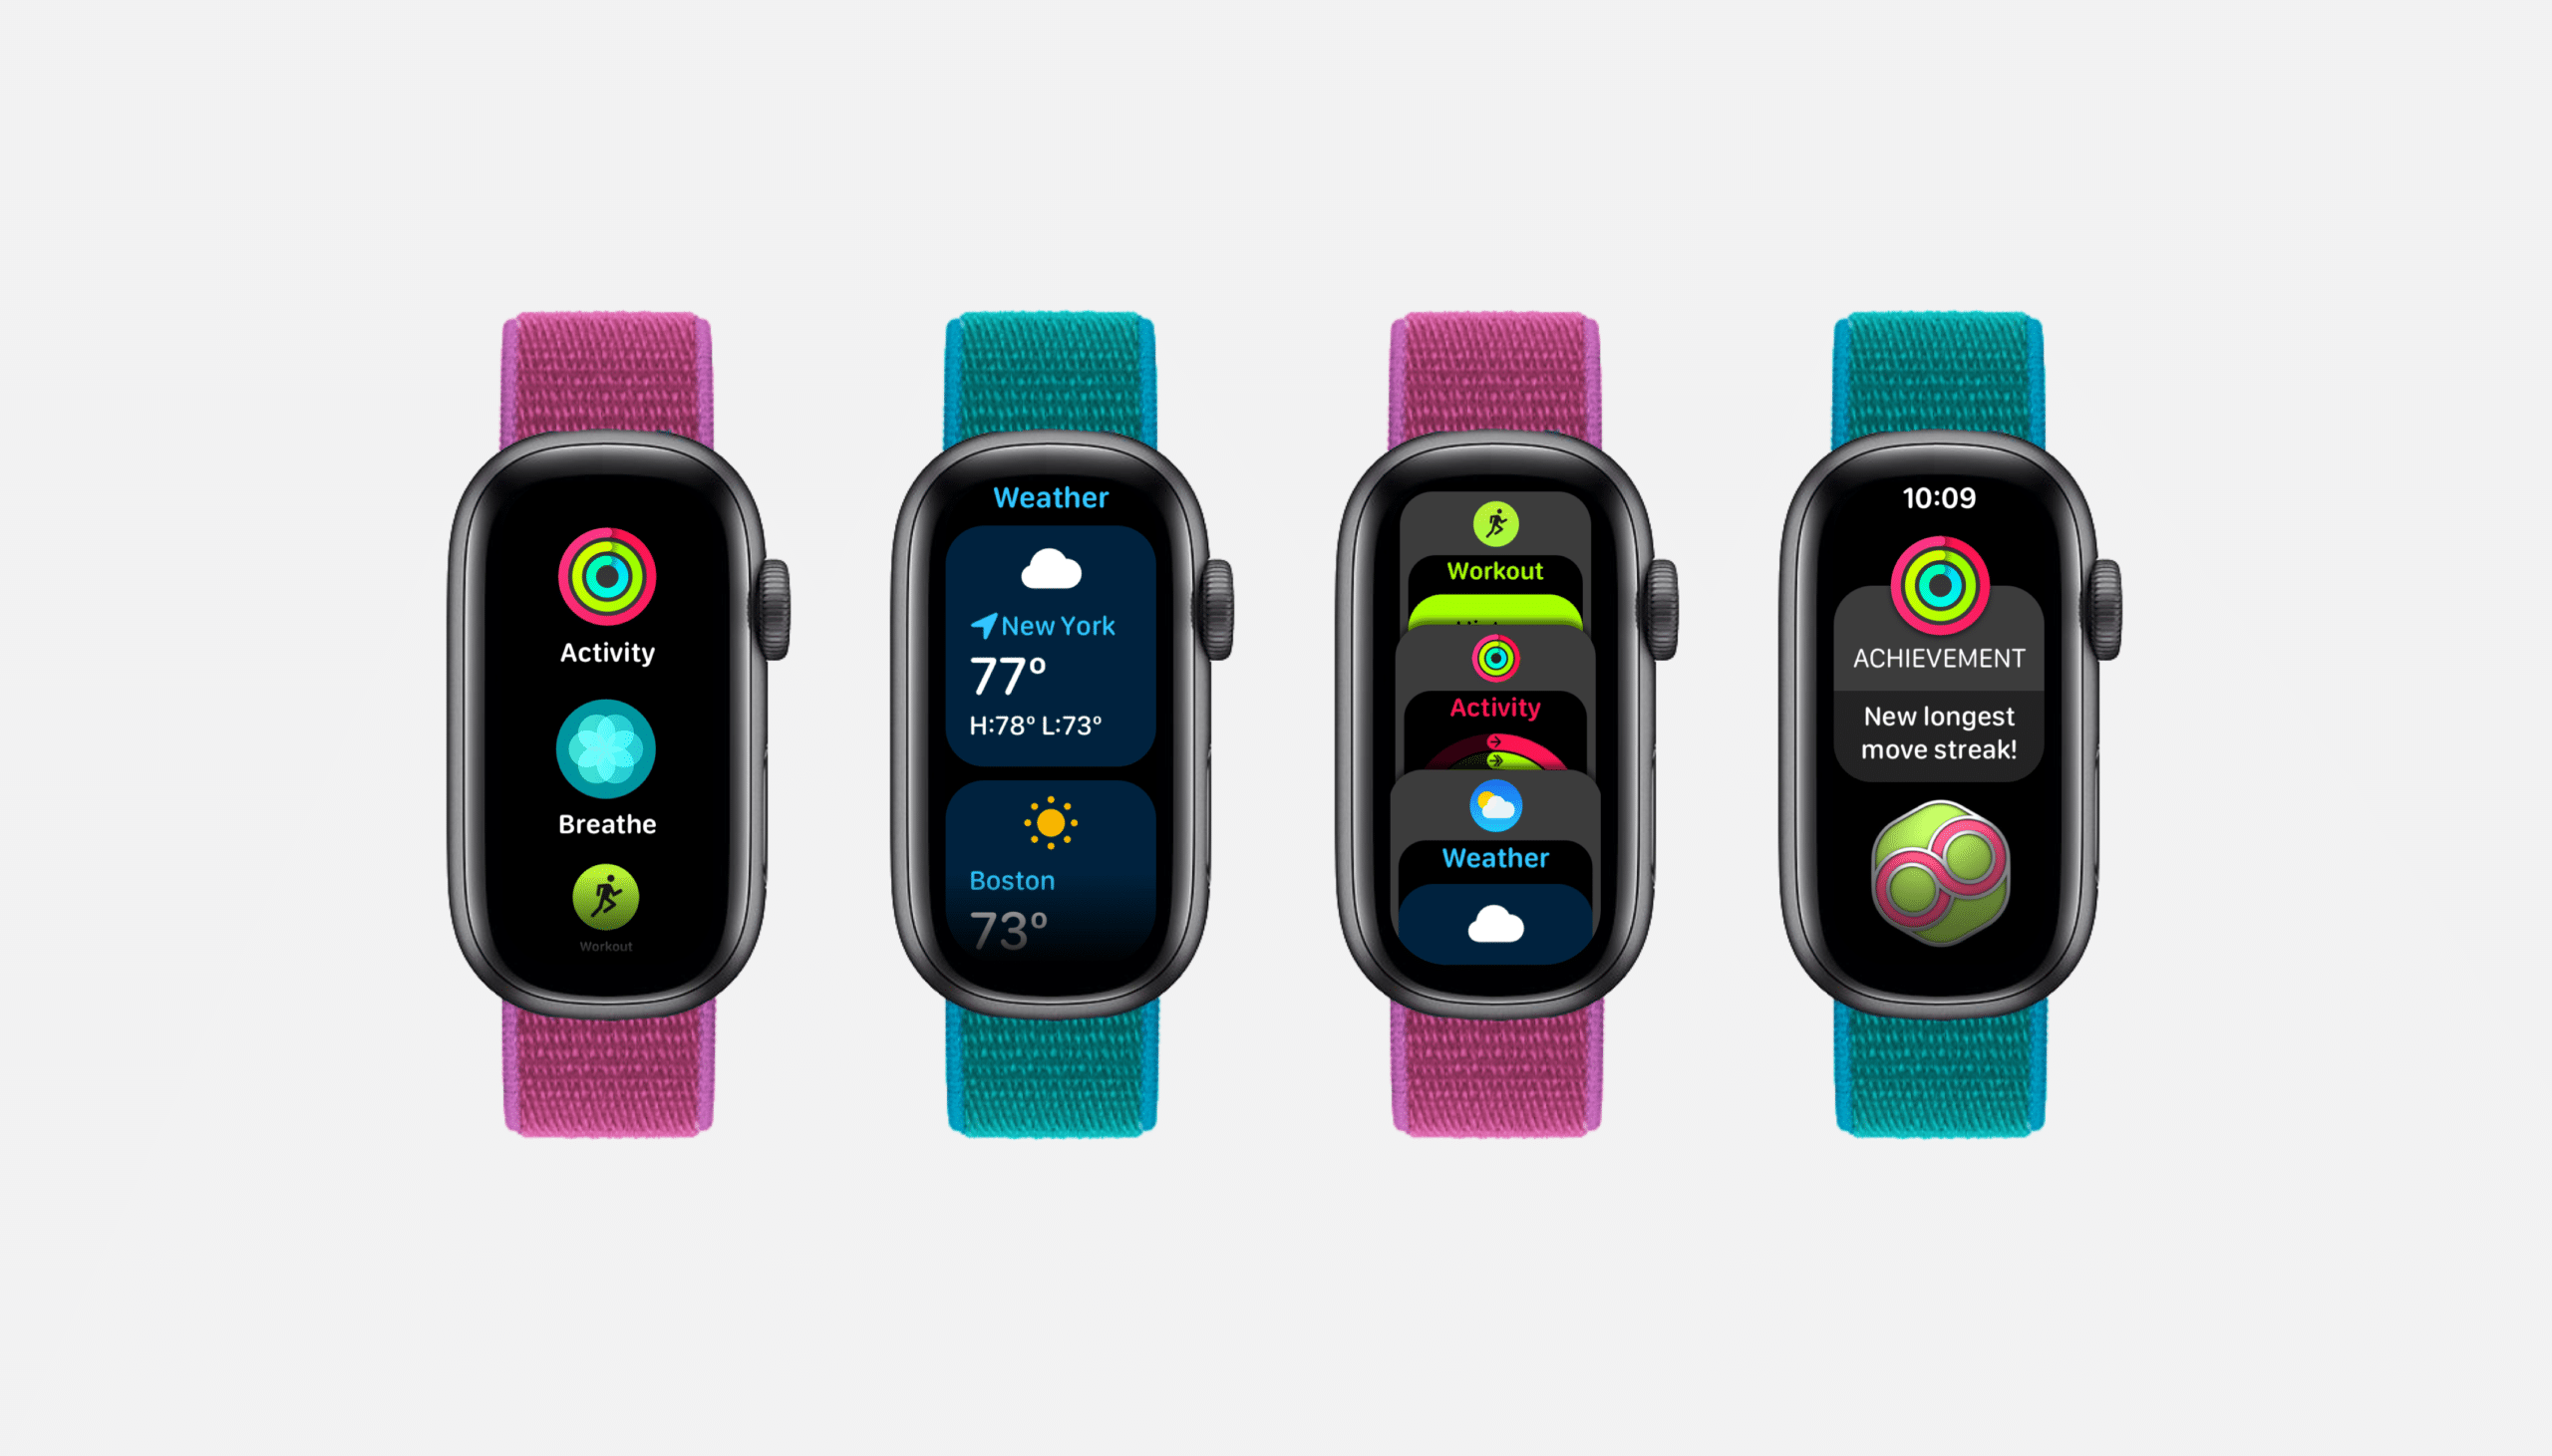 Conceito de Apple Watch Fit por Parker Ortolani